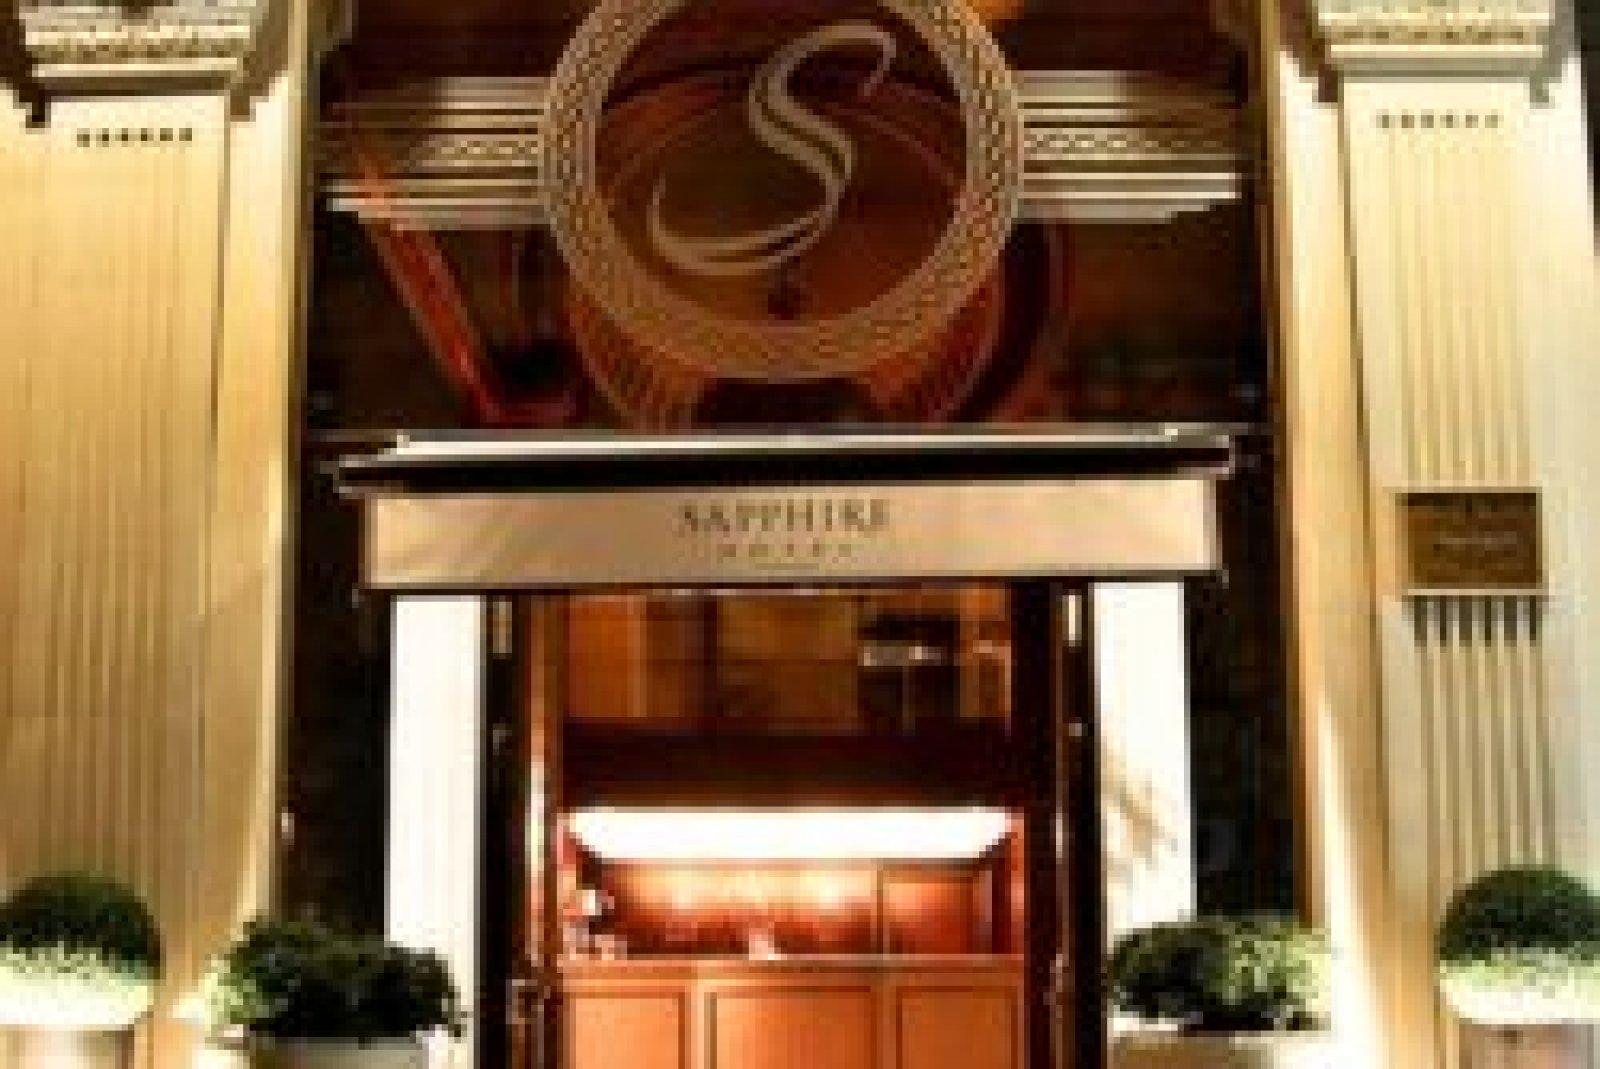 Sapphire Otel, Gürcistan